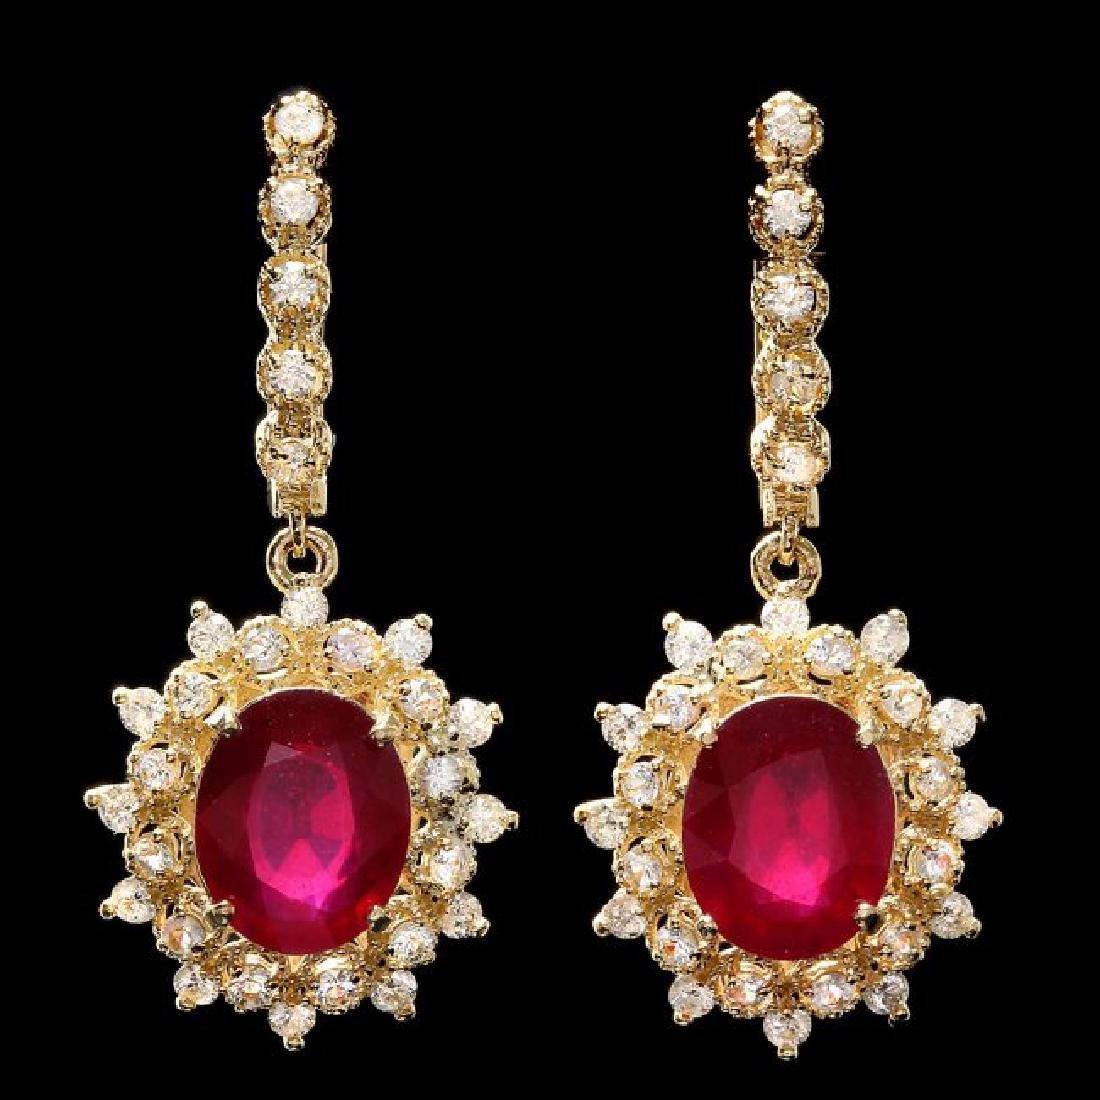 14k Gold 8.00ct Ruby 1.90ct Diamond Earrings